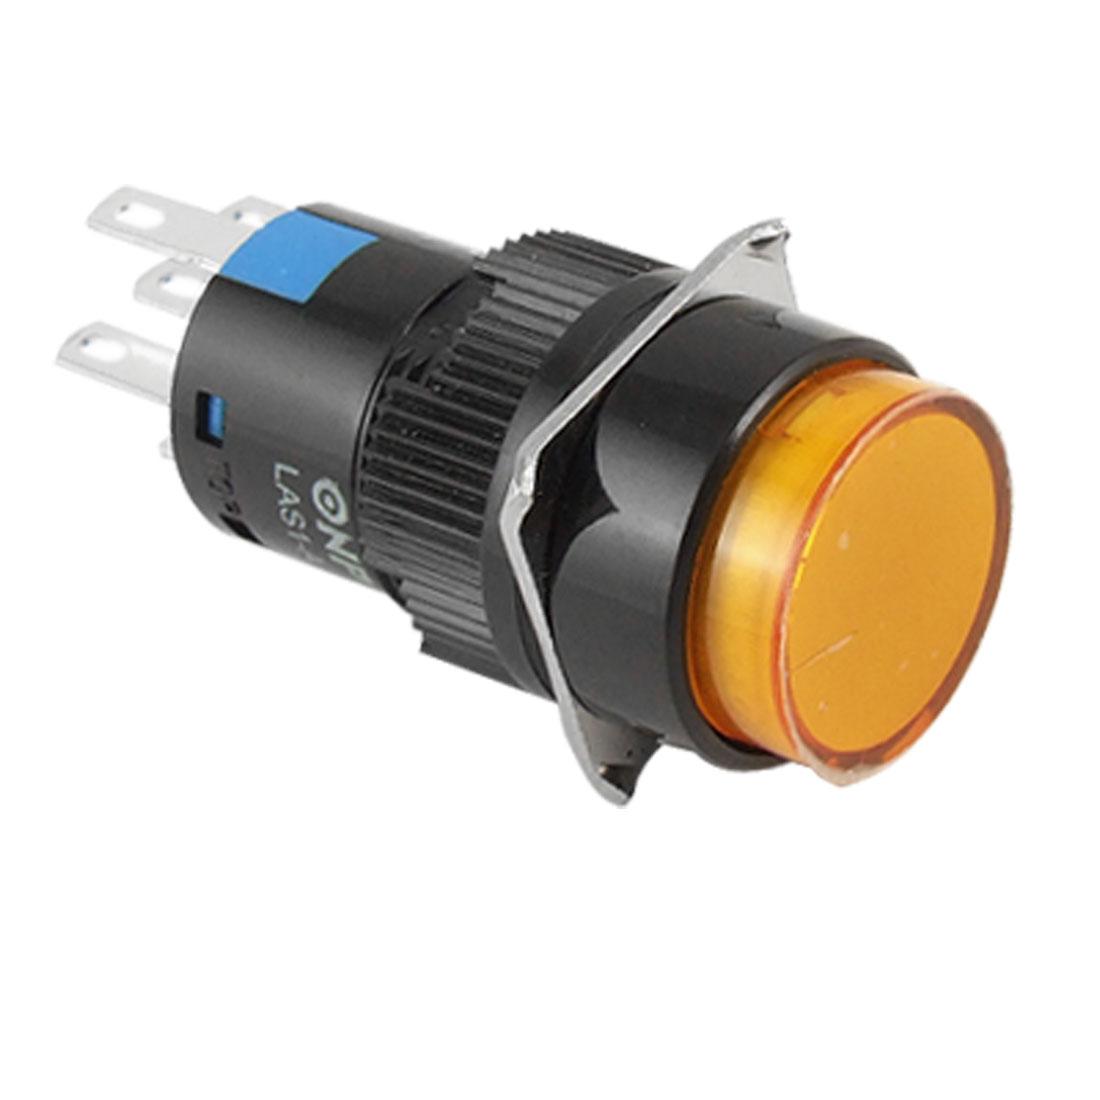 DC 24V Orange Round Cap Lamp Panel Mount 5 Pins Push Button Switch